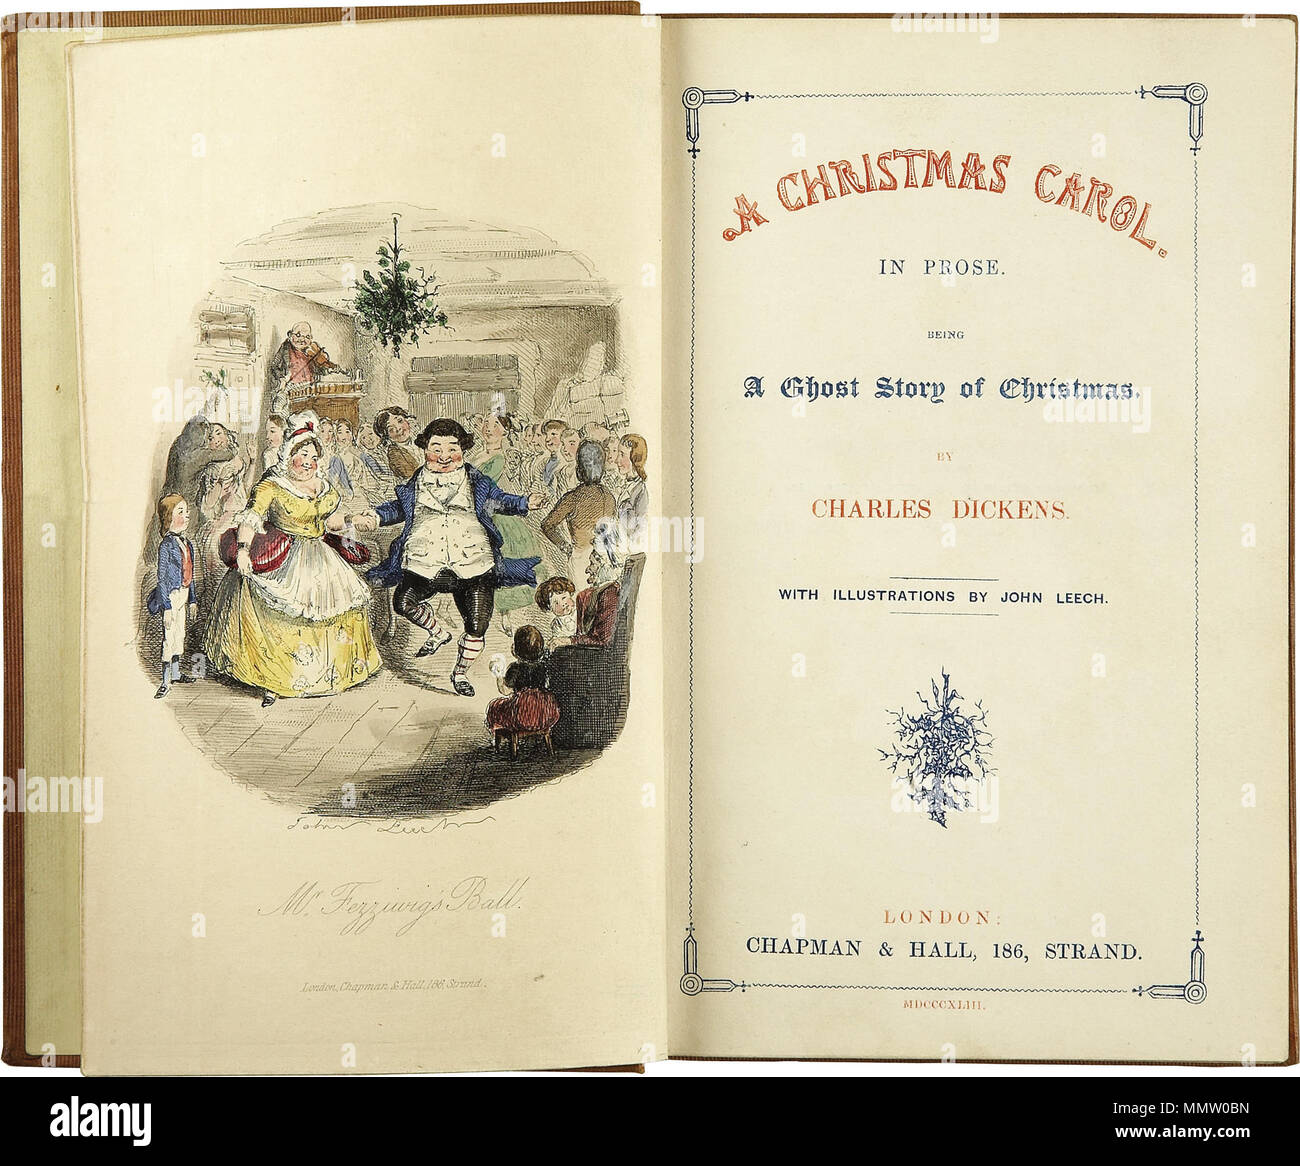 a christmas carol description